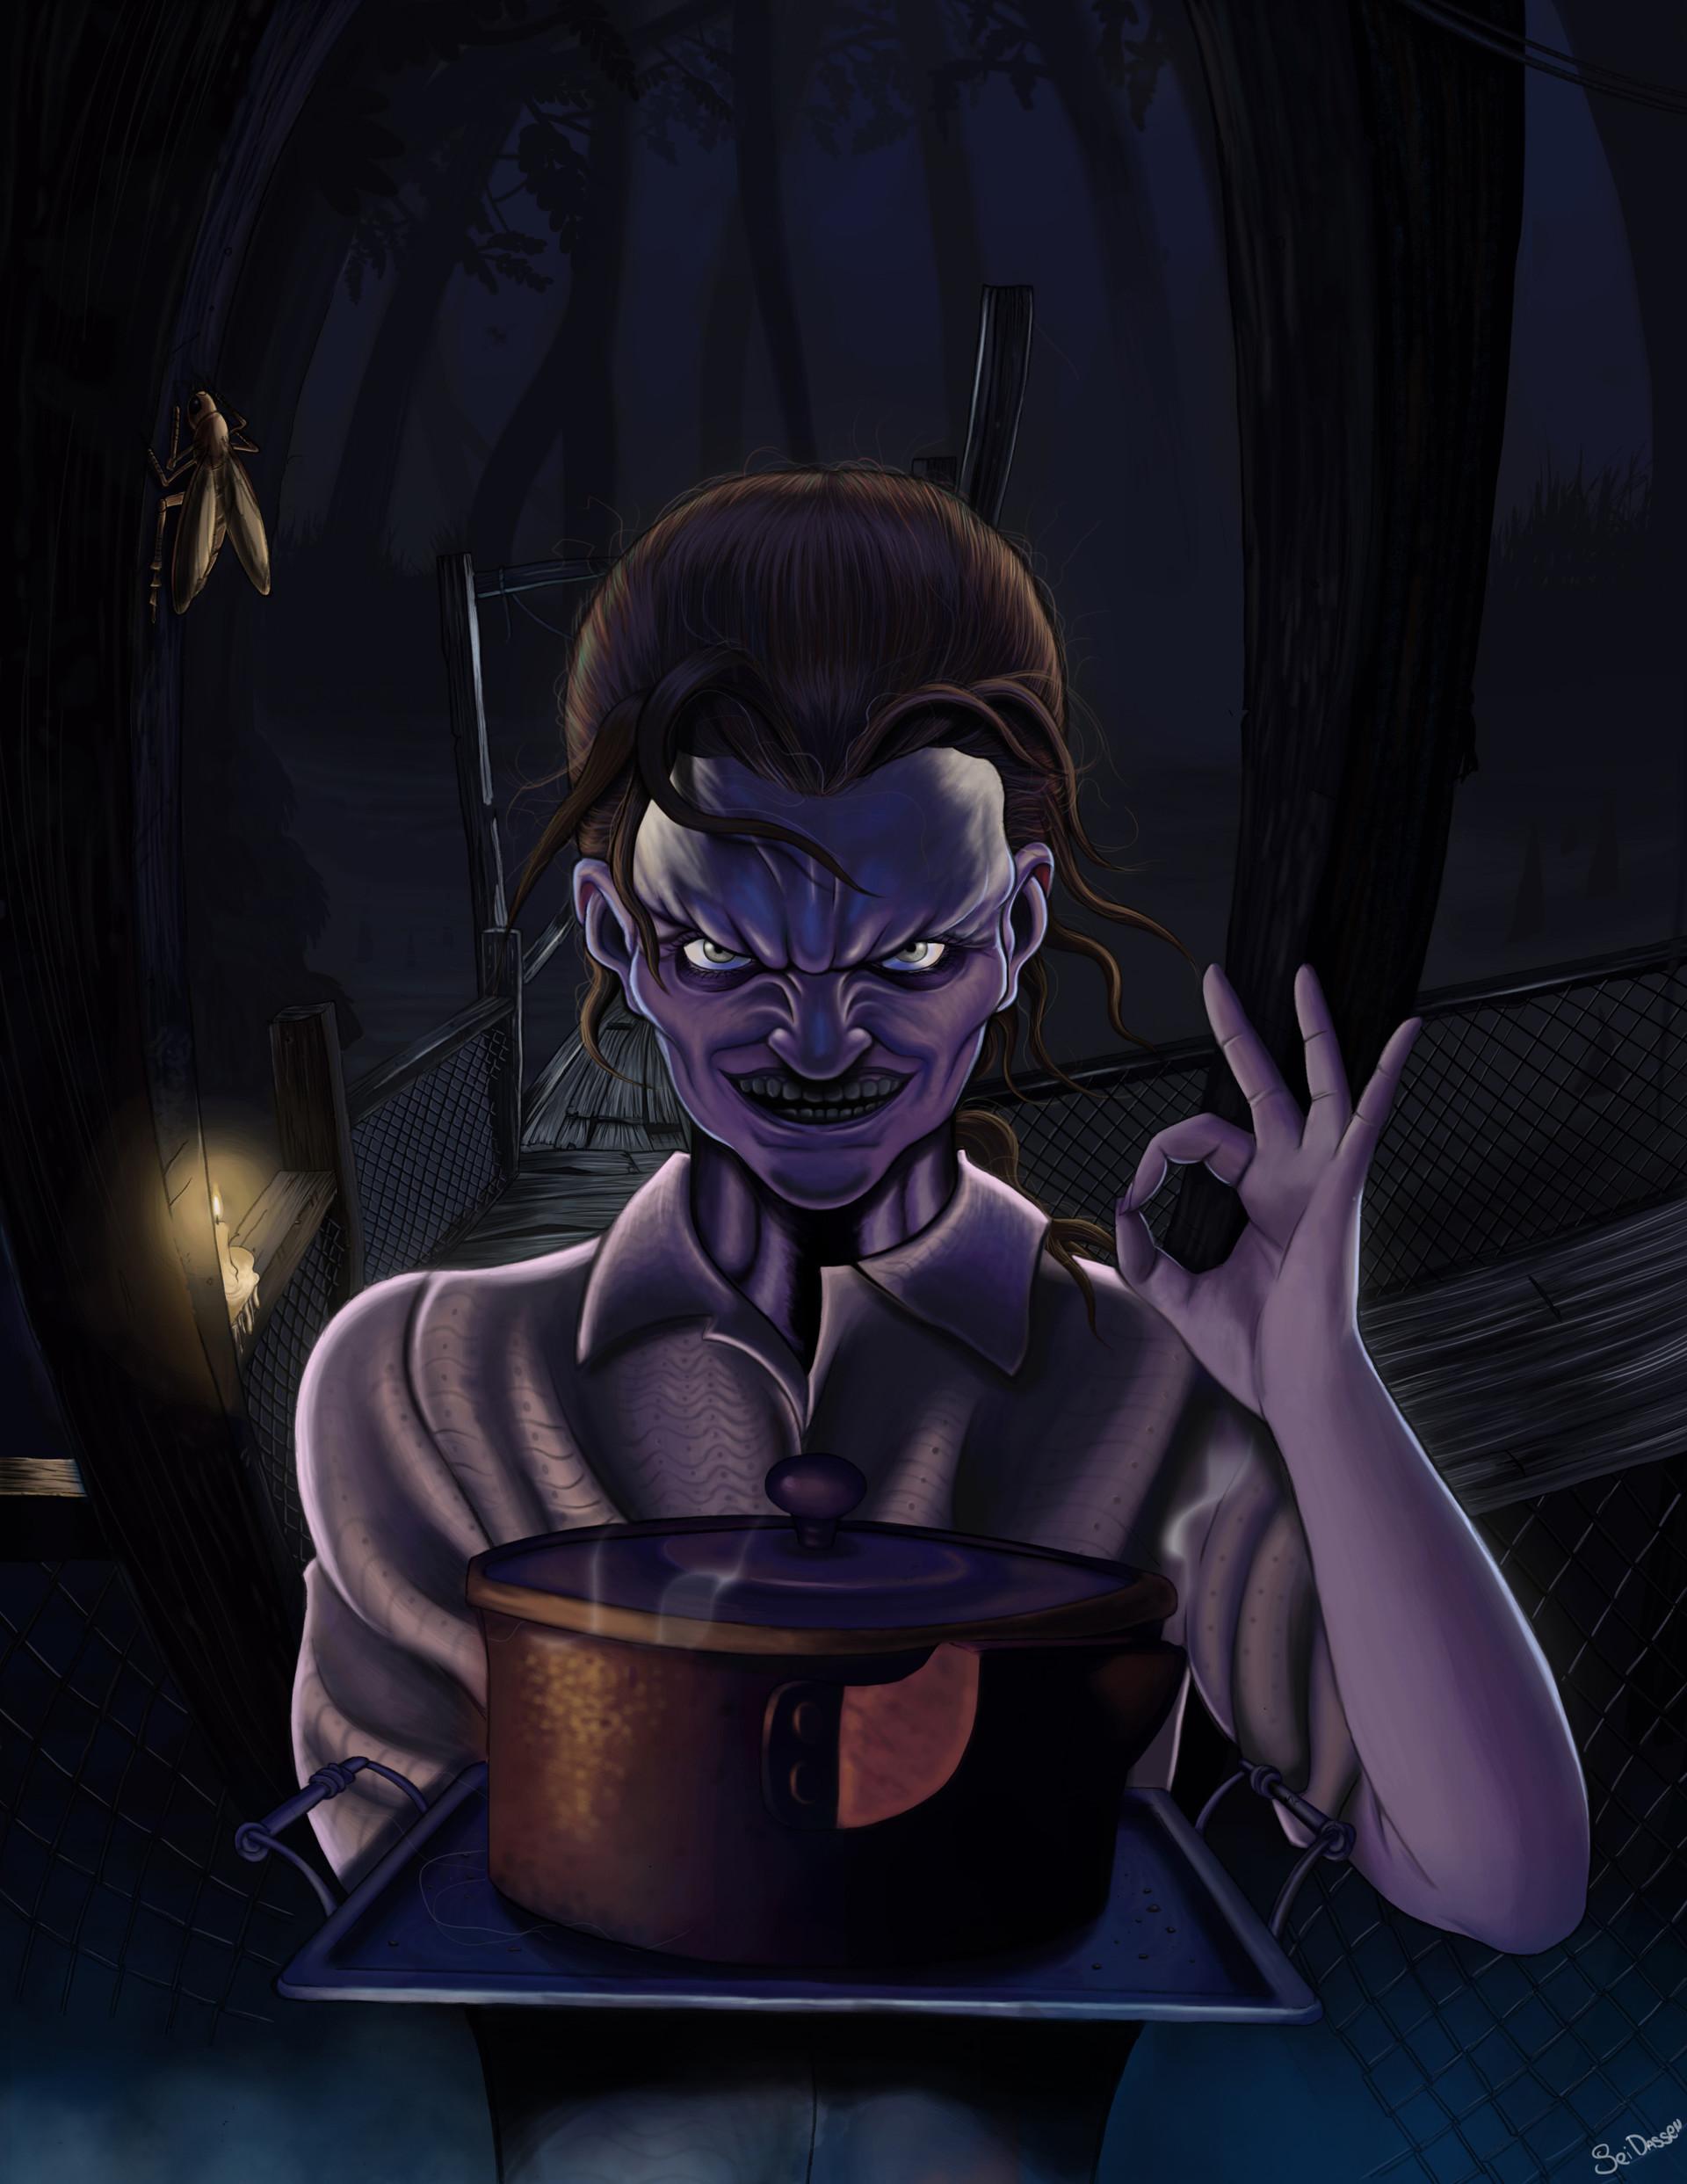 Artstation Marguerite Baker Resident Evil 7 Fanart Ignacio Zurita